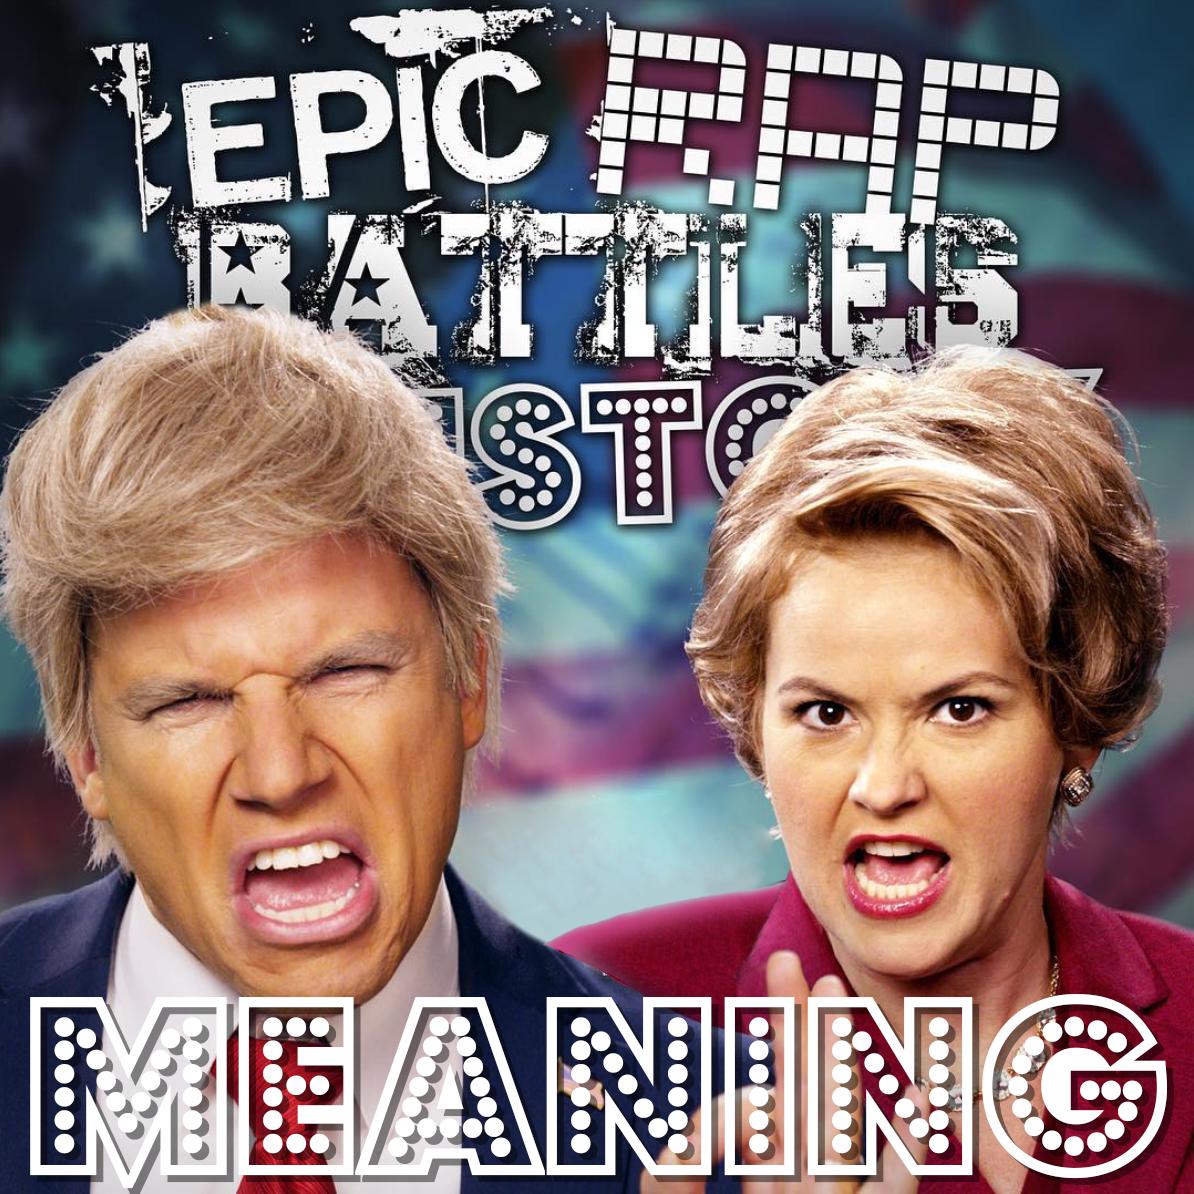 donald trump vs hillary clinton rap meanings epic rap battles of